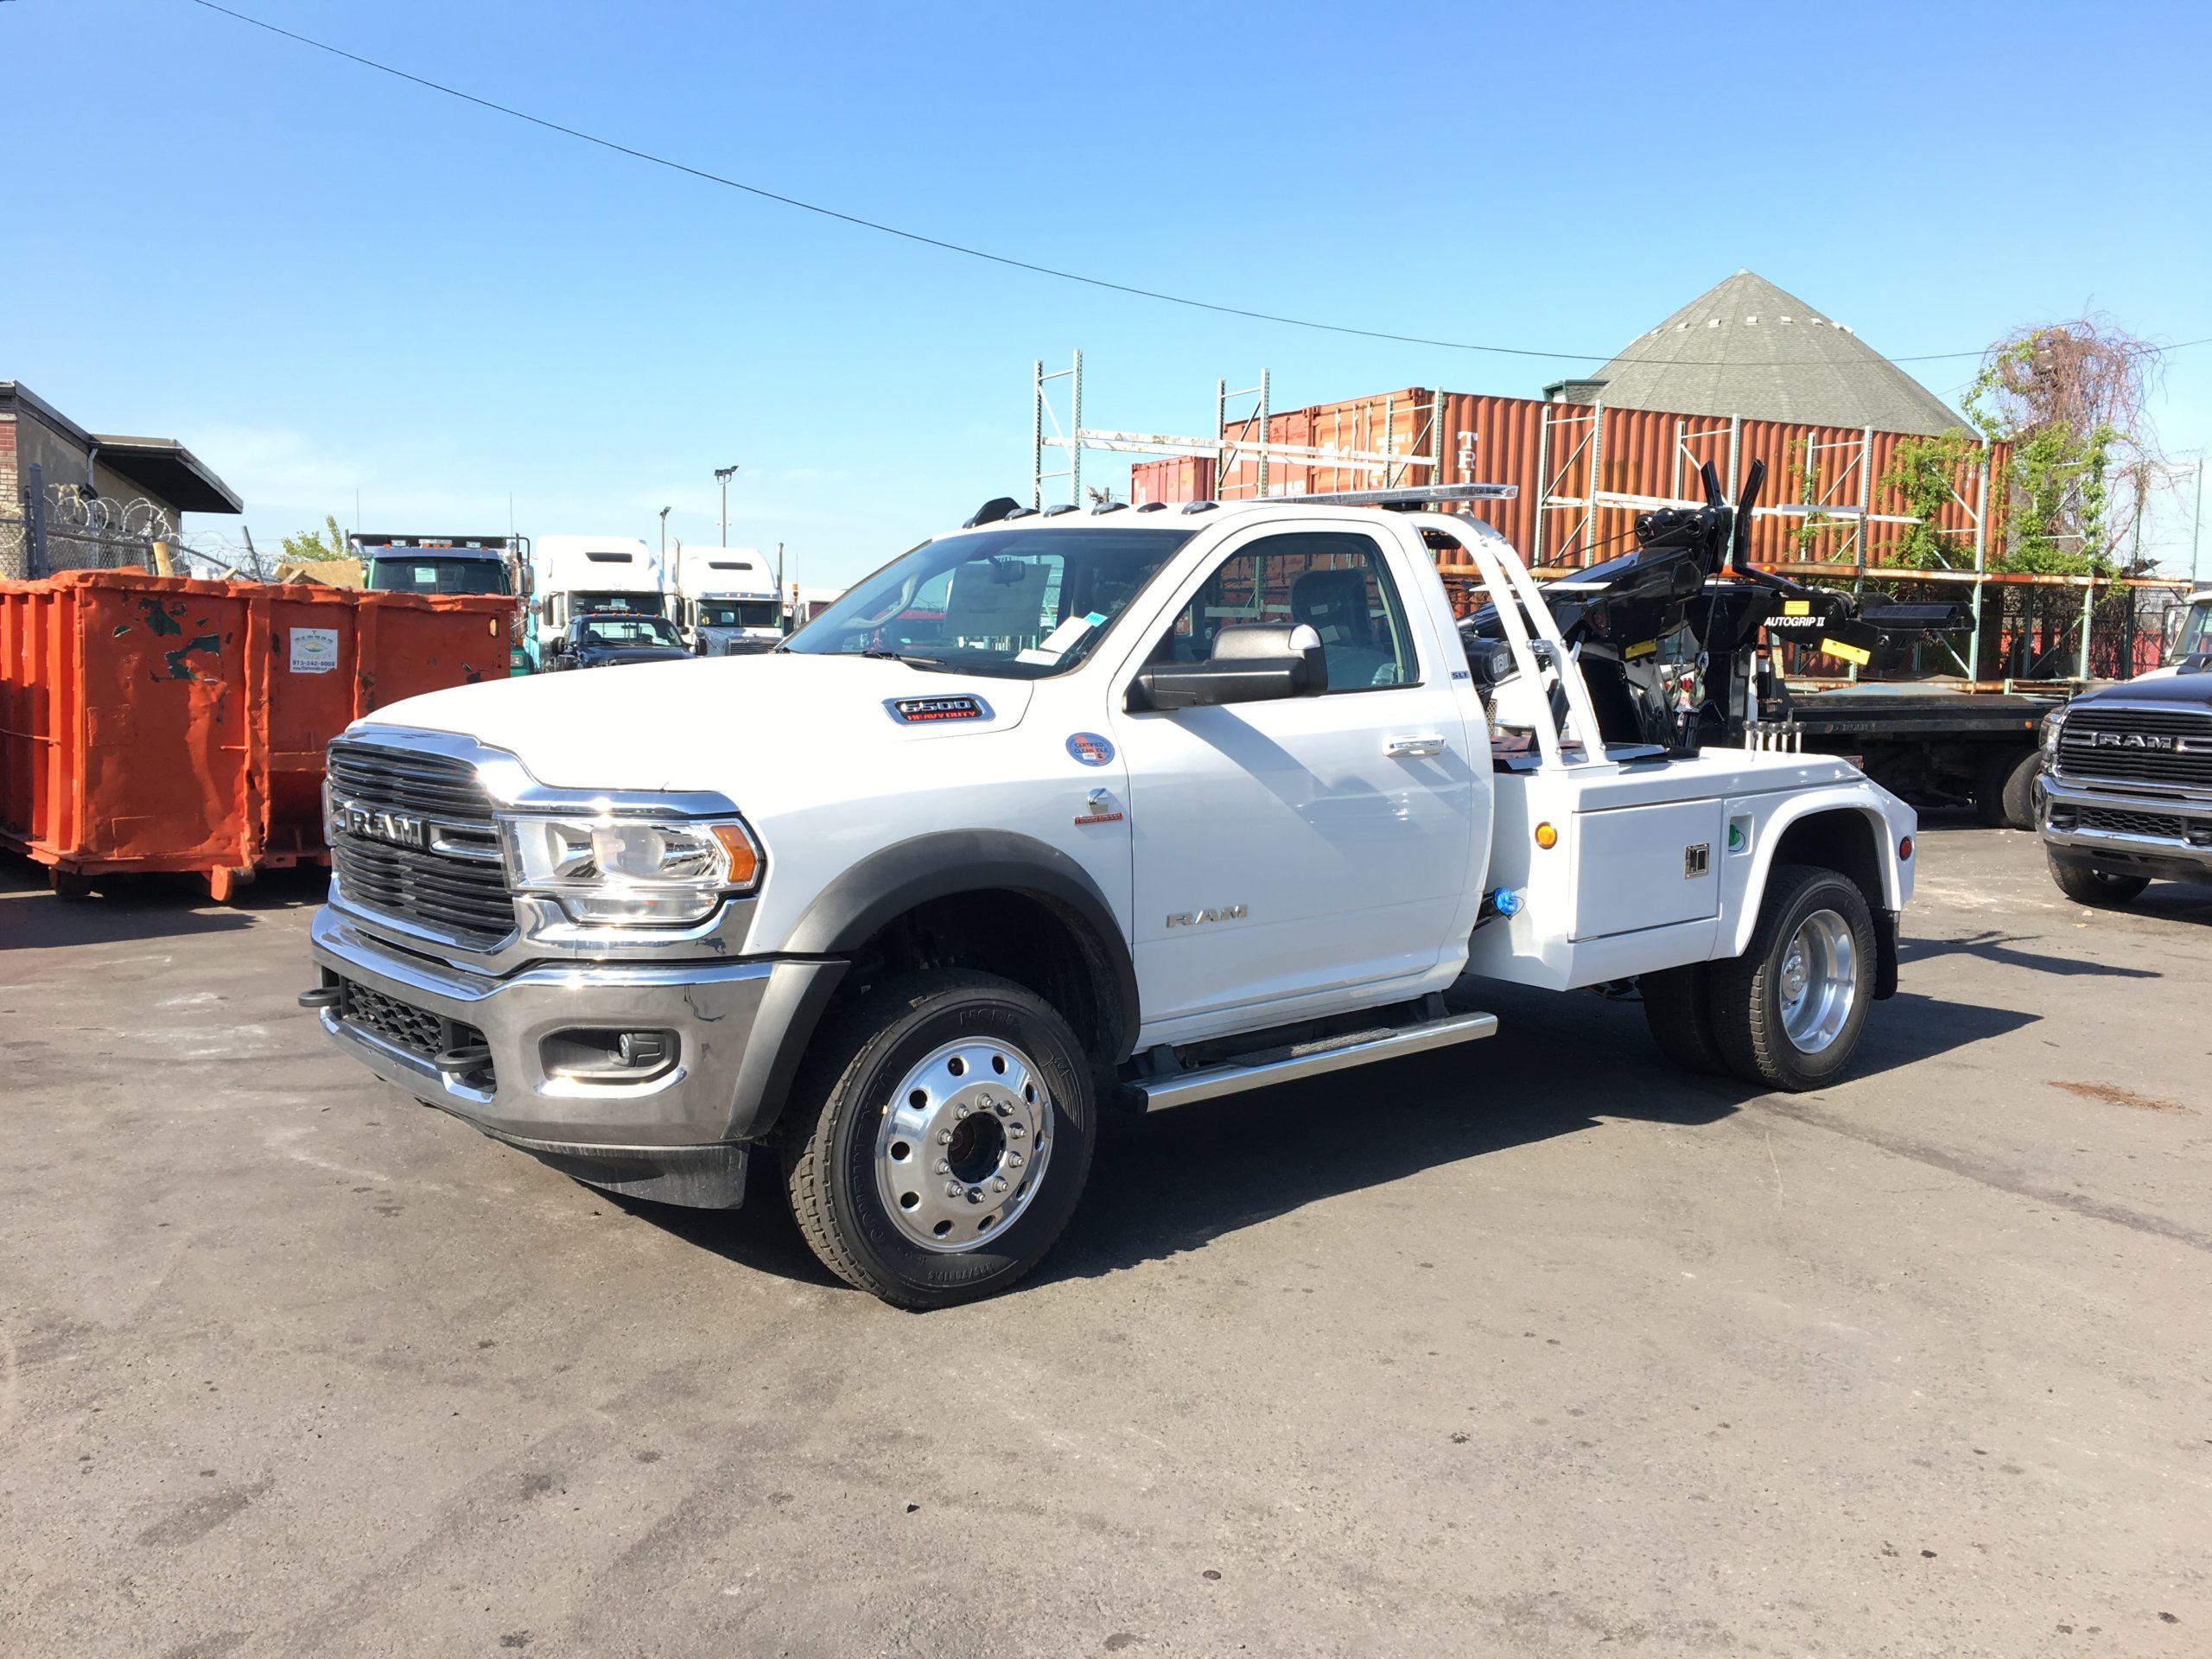 3079: 2019 Dodge 5500 4×4 w Chevron 408TA Tow Truck